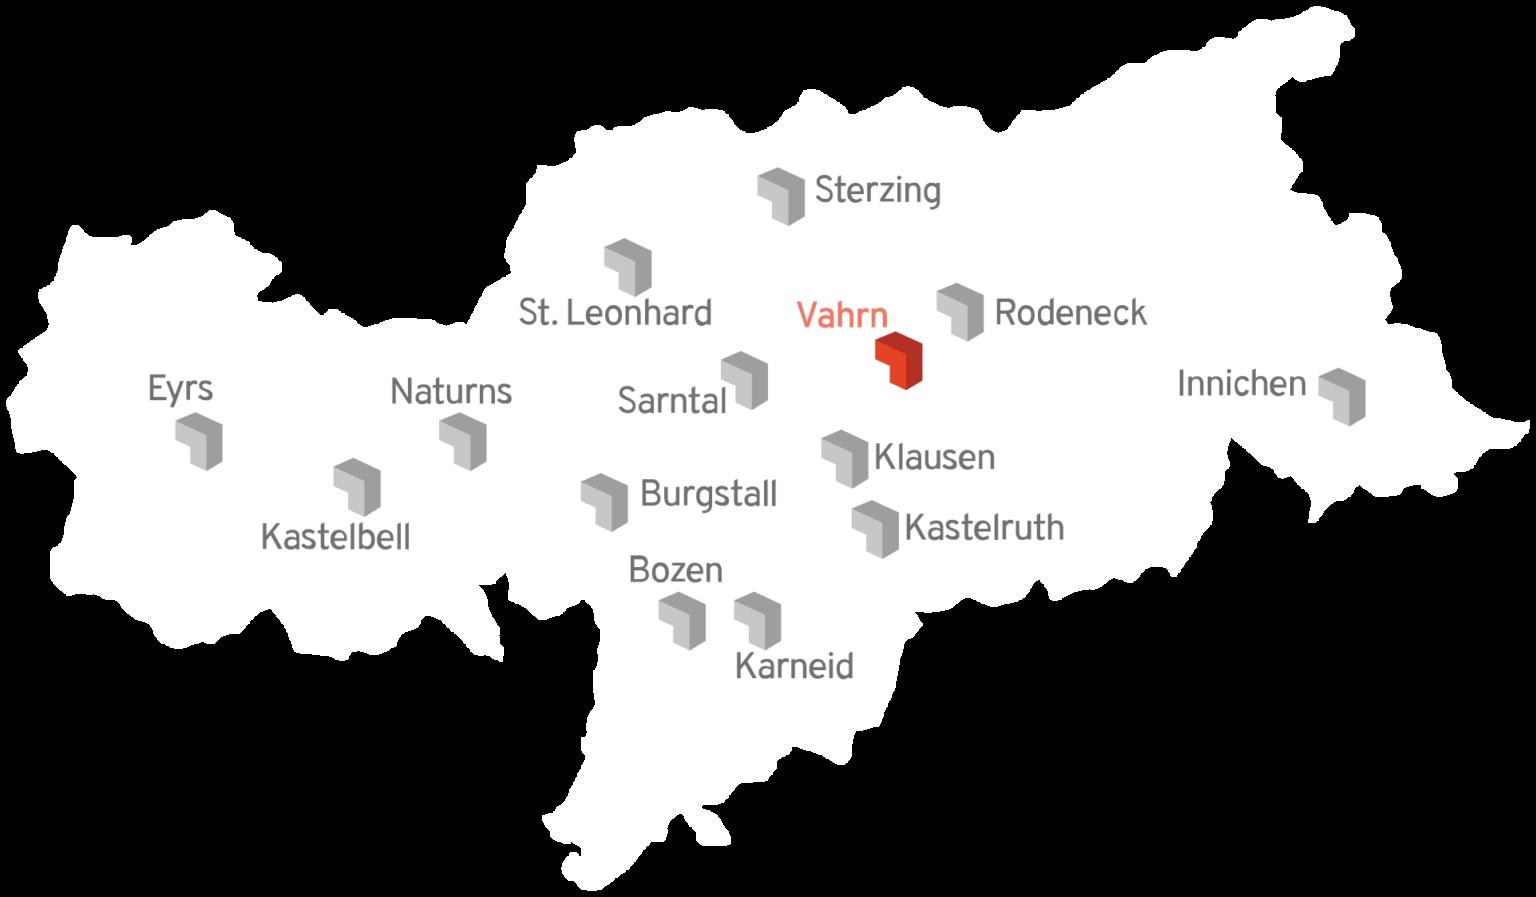 Baugroup Karte Standorte